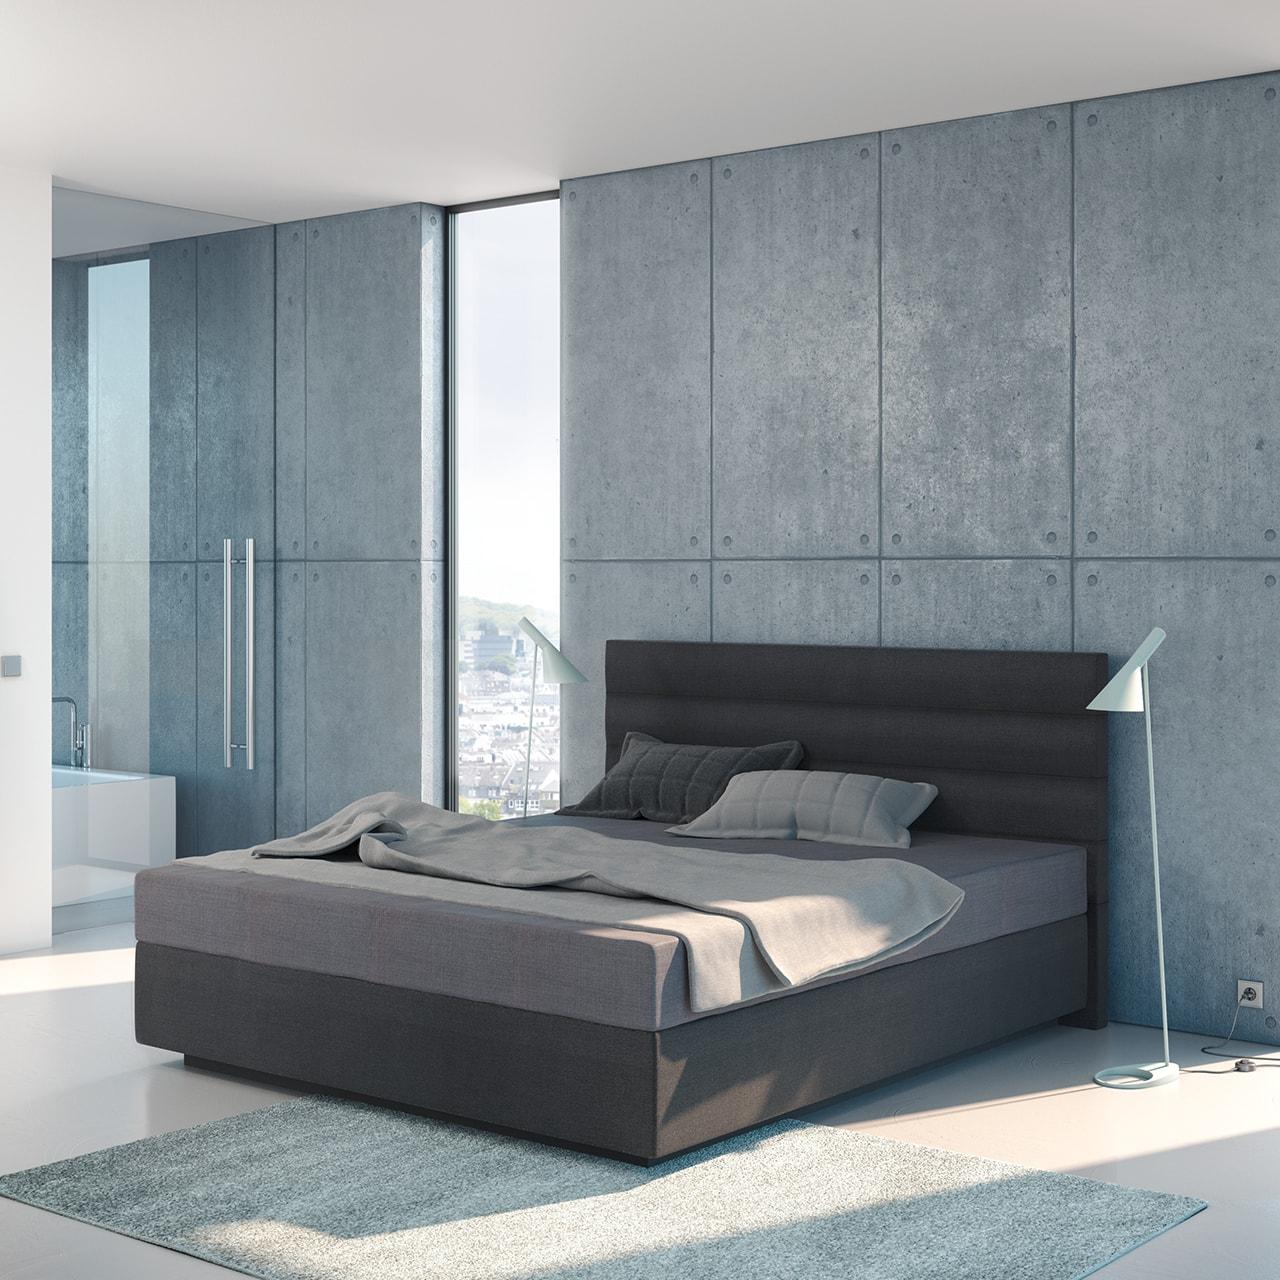 wasserbett komplett sets suma wasserbetten. Black Bedroom Furniture Sets. Home Design Ideas